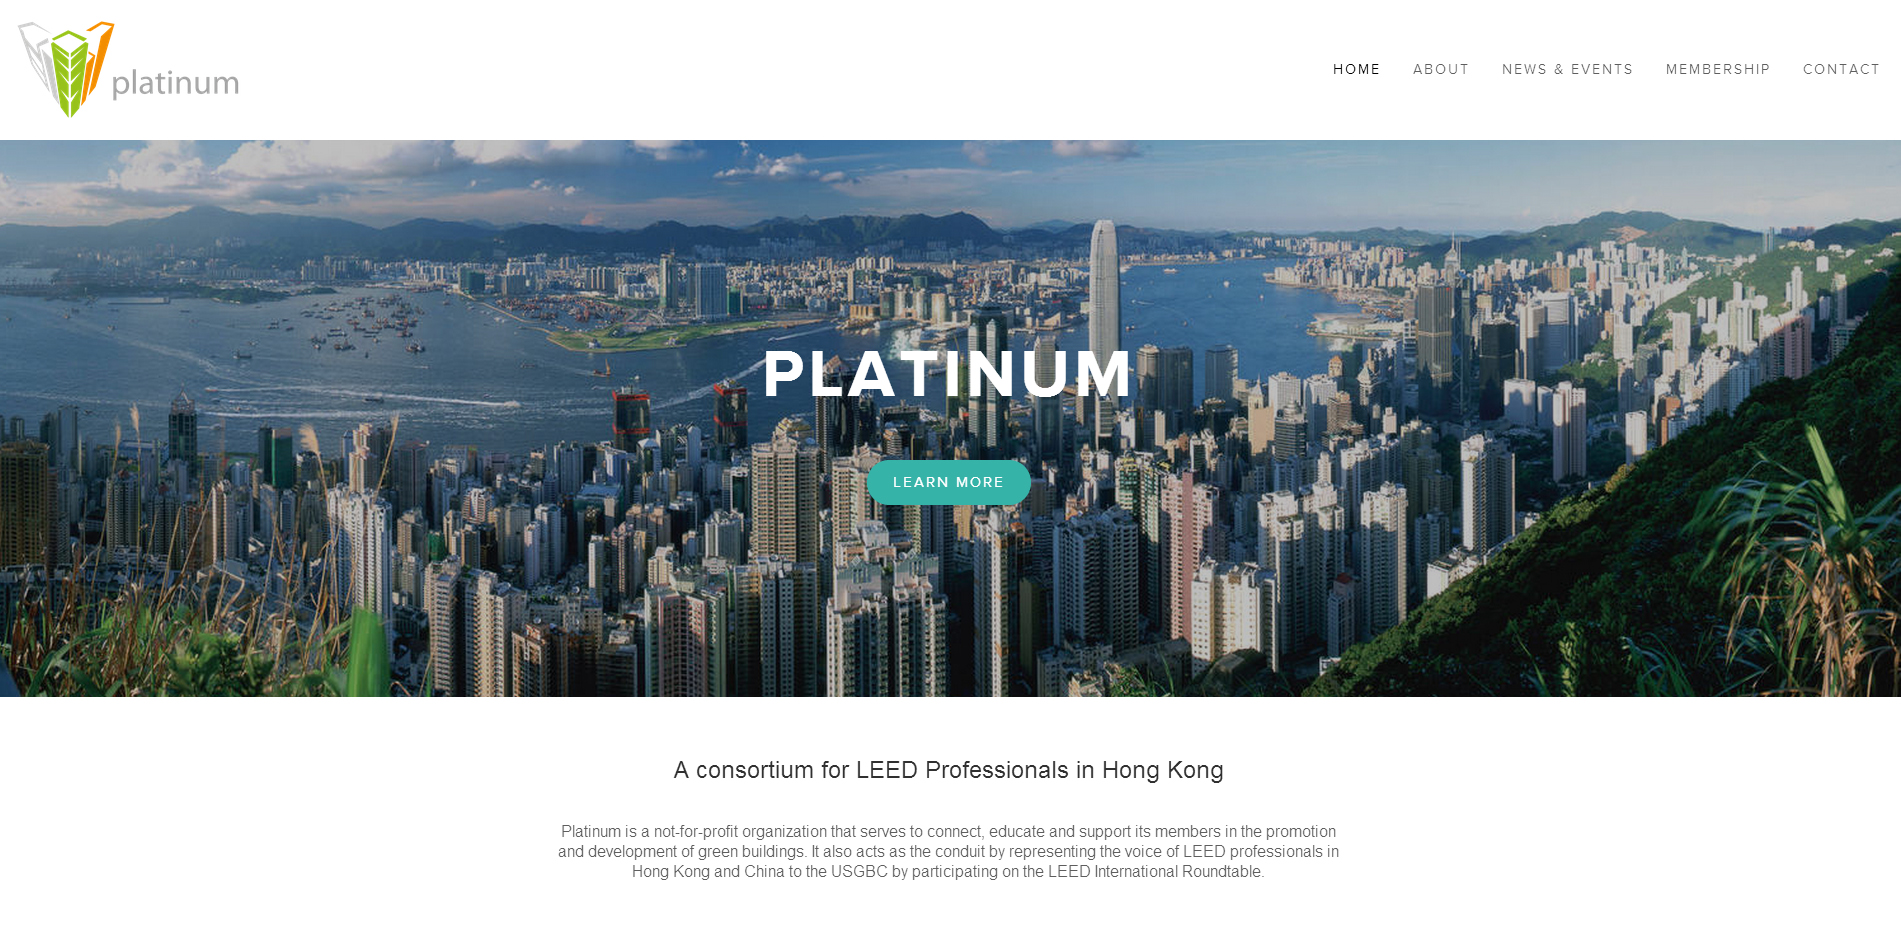 platinum_website.jpg